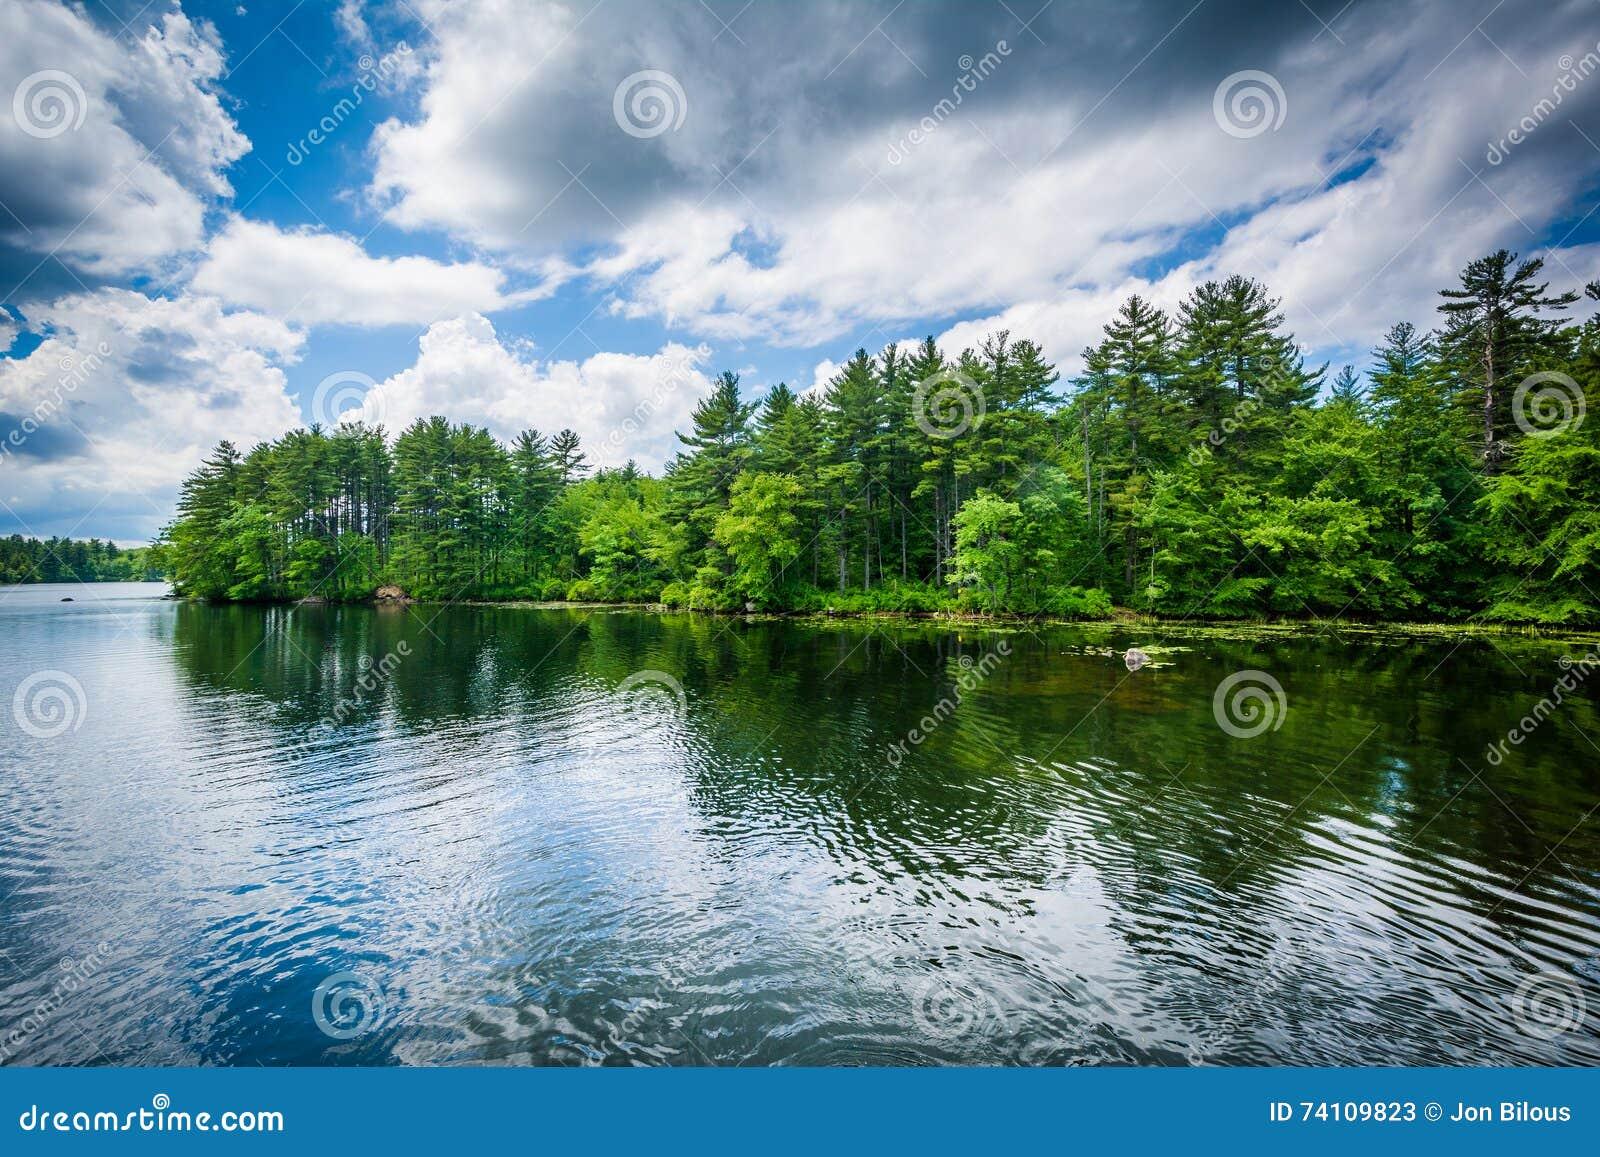 大P美國日記: Massabesic Lake, Manchester NH / 第二次遊冰淇淋湖